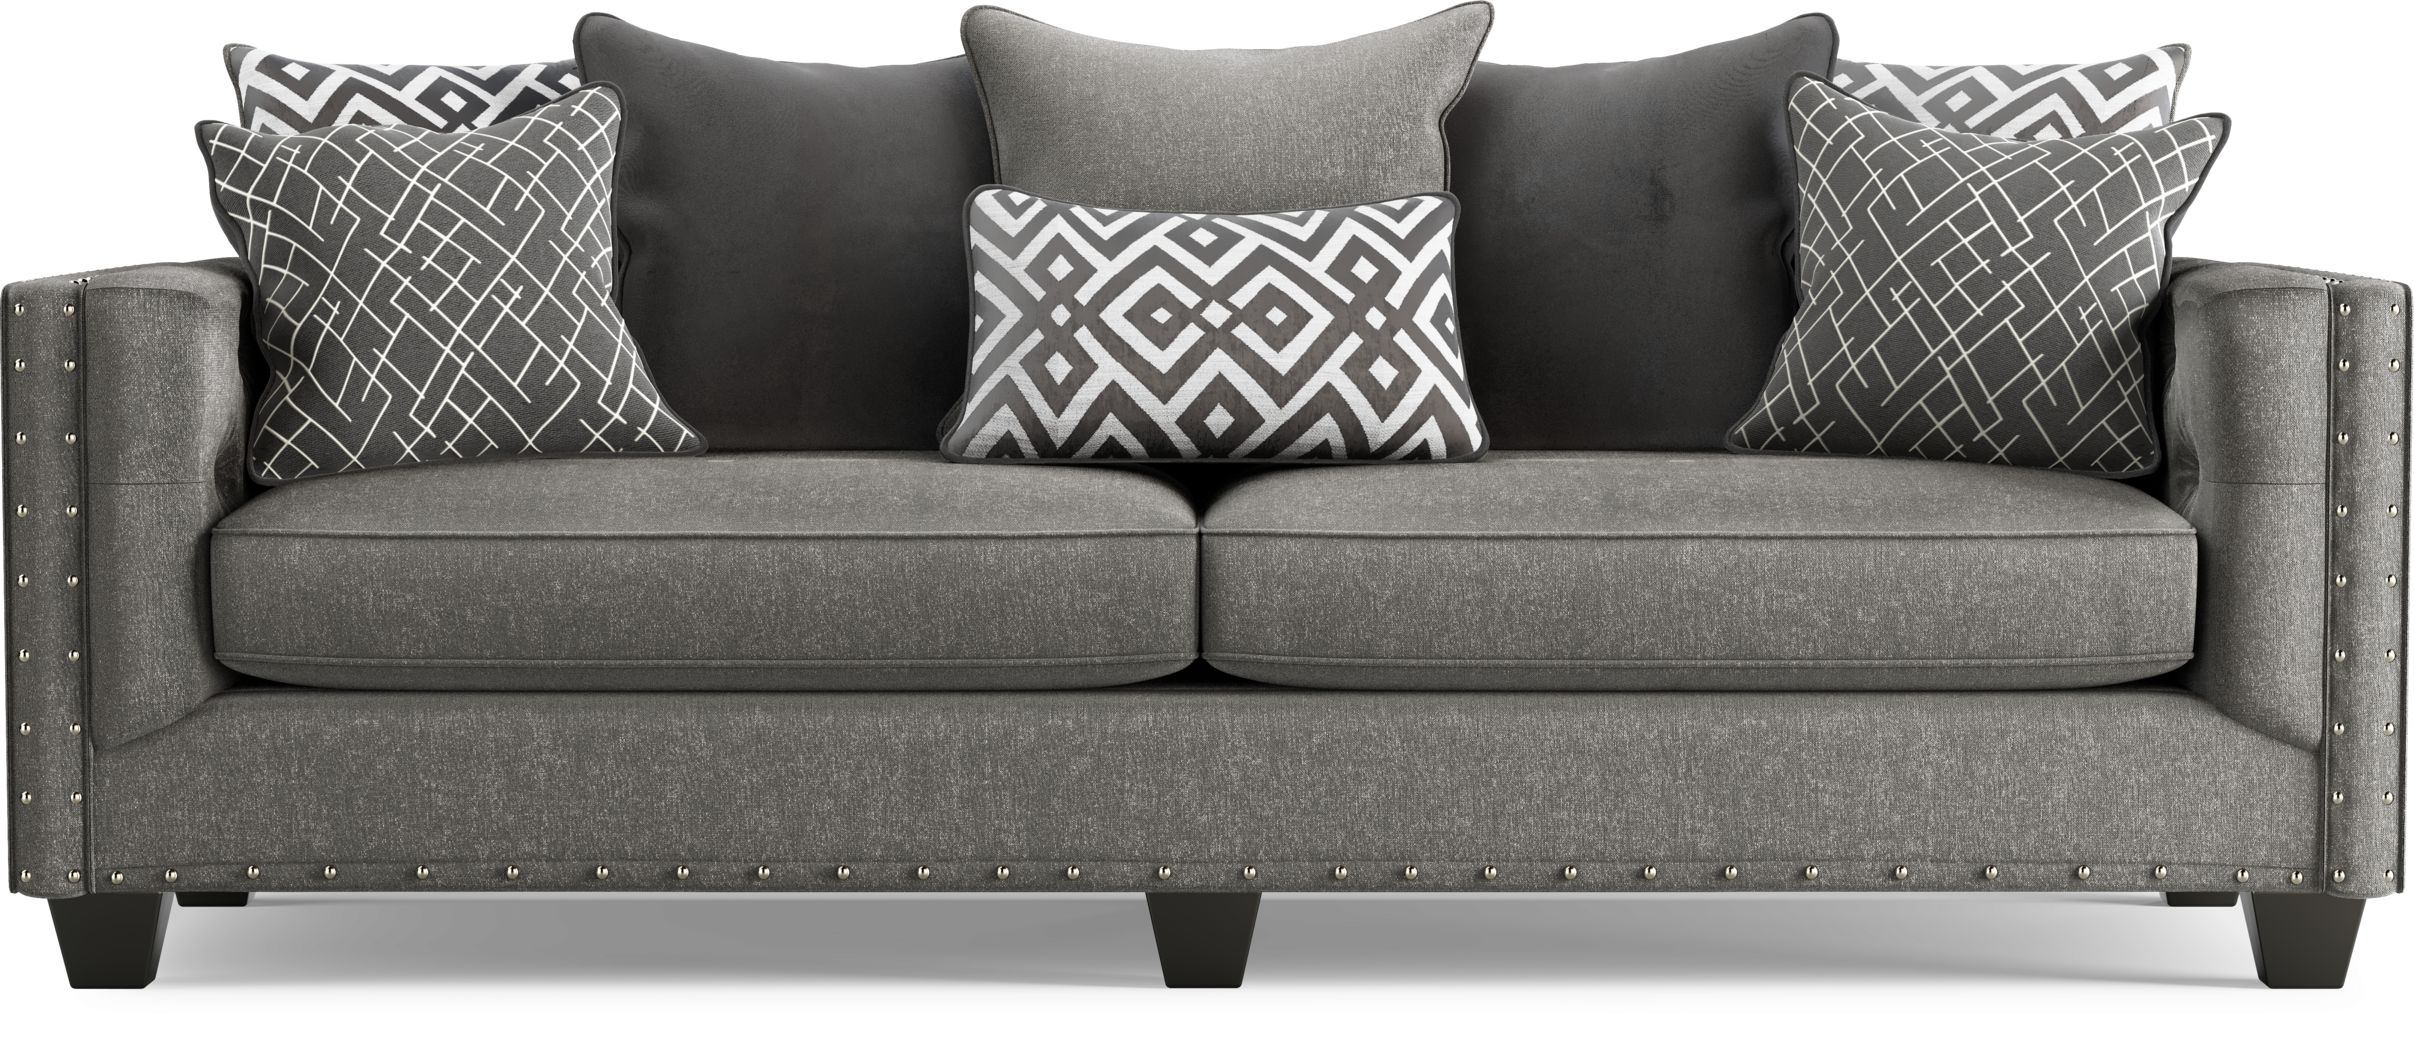 Cindy Crawford Home Chelsea Hills Gray Sofa